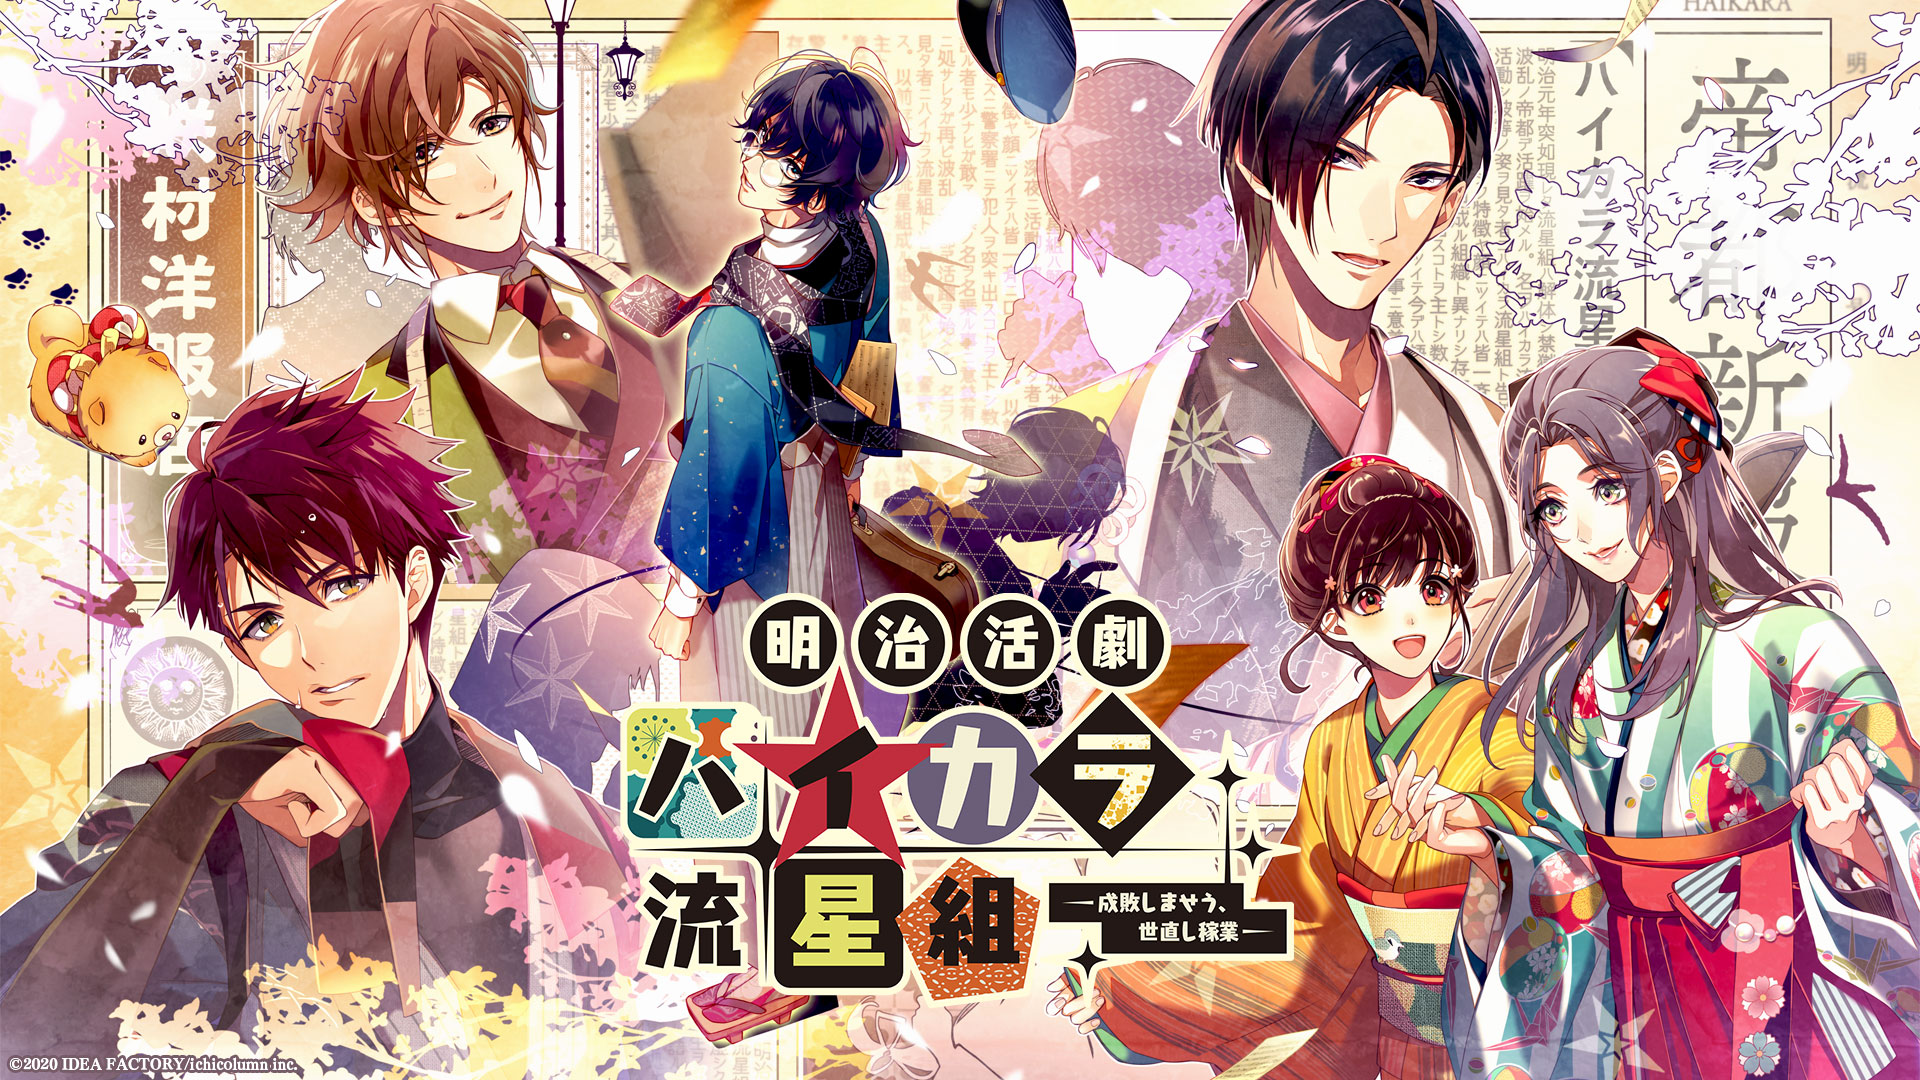 Meiji Katsugeki Haikara Ryuuseigumi Wallpaper #2710469 - Zerochan Anime  Image Board